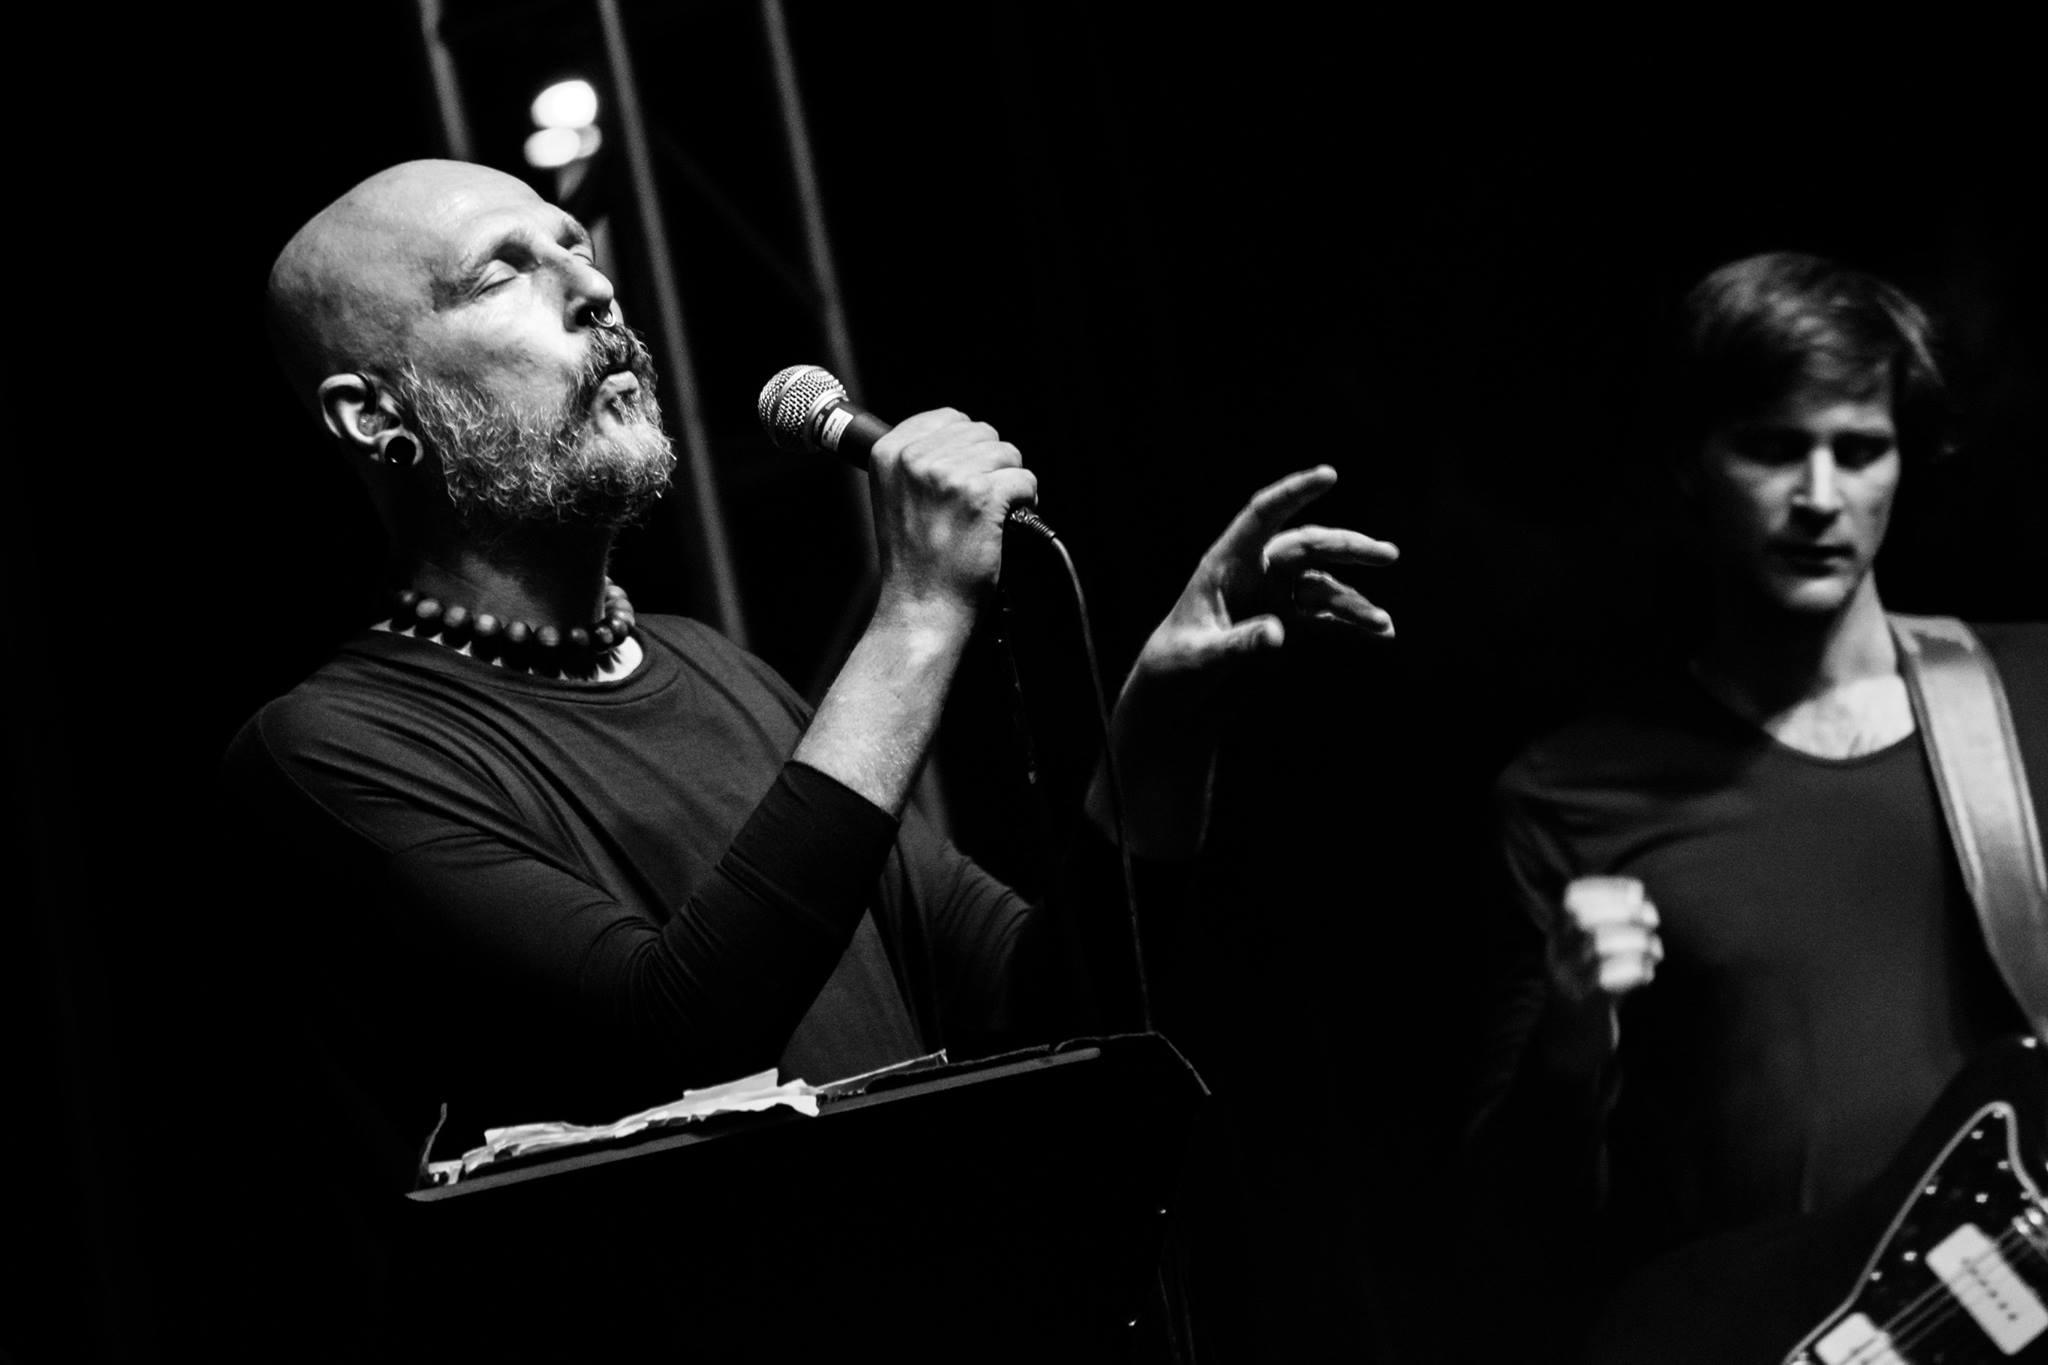 damir-urban-koncert-fotografija